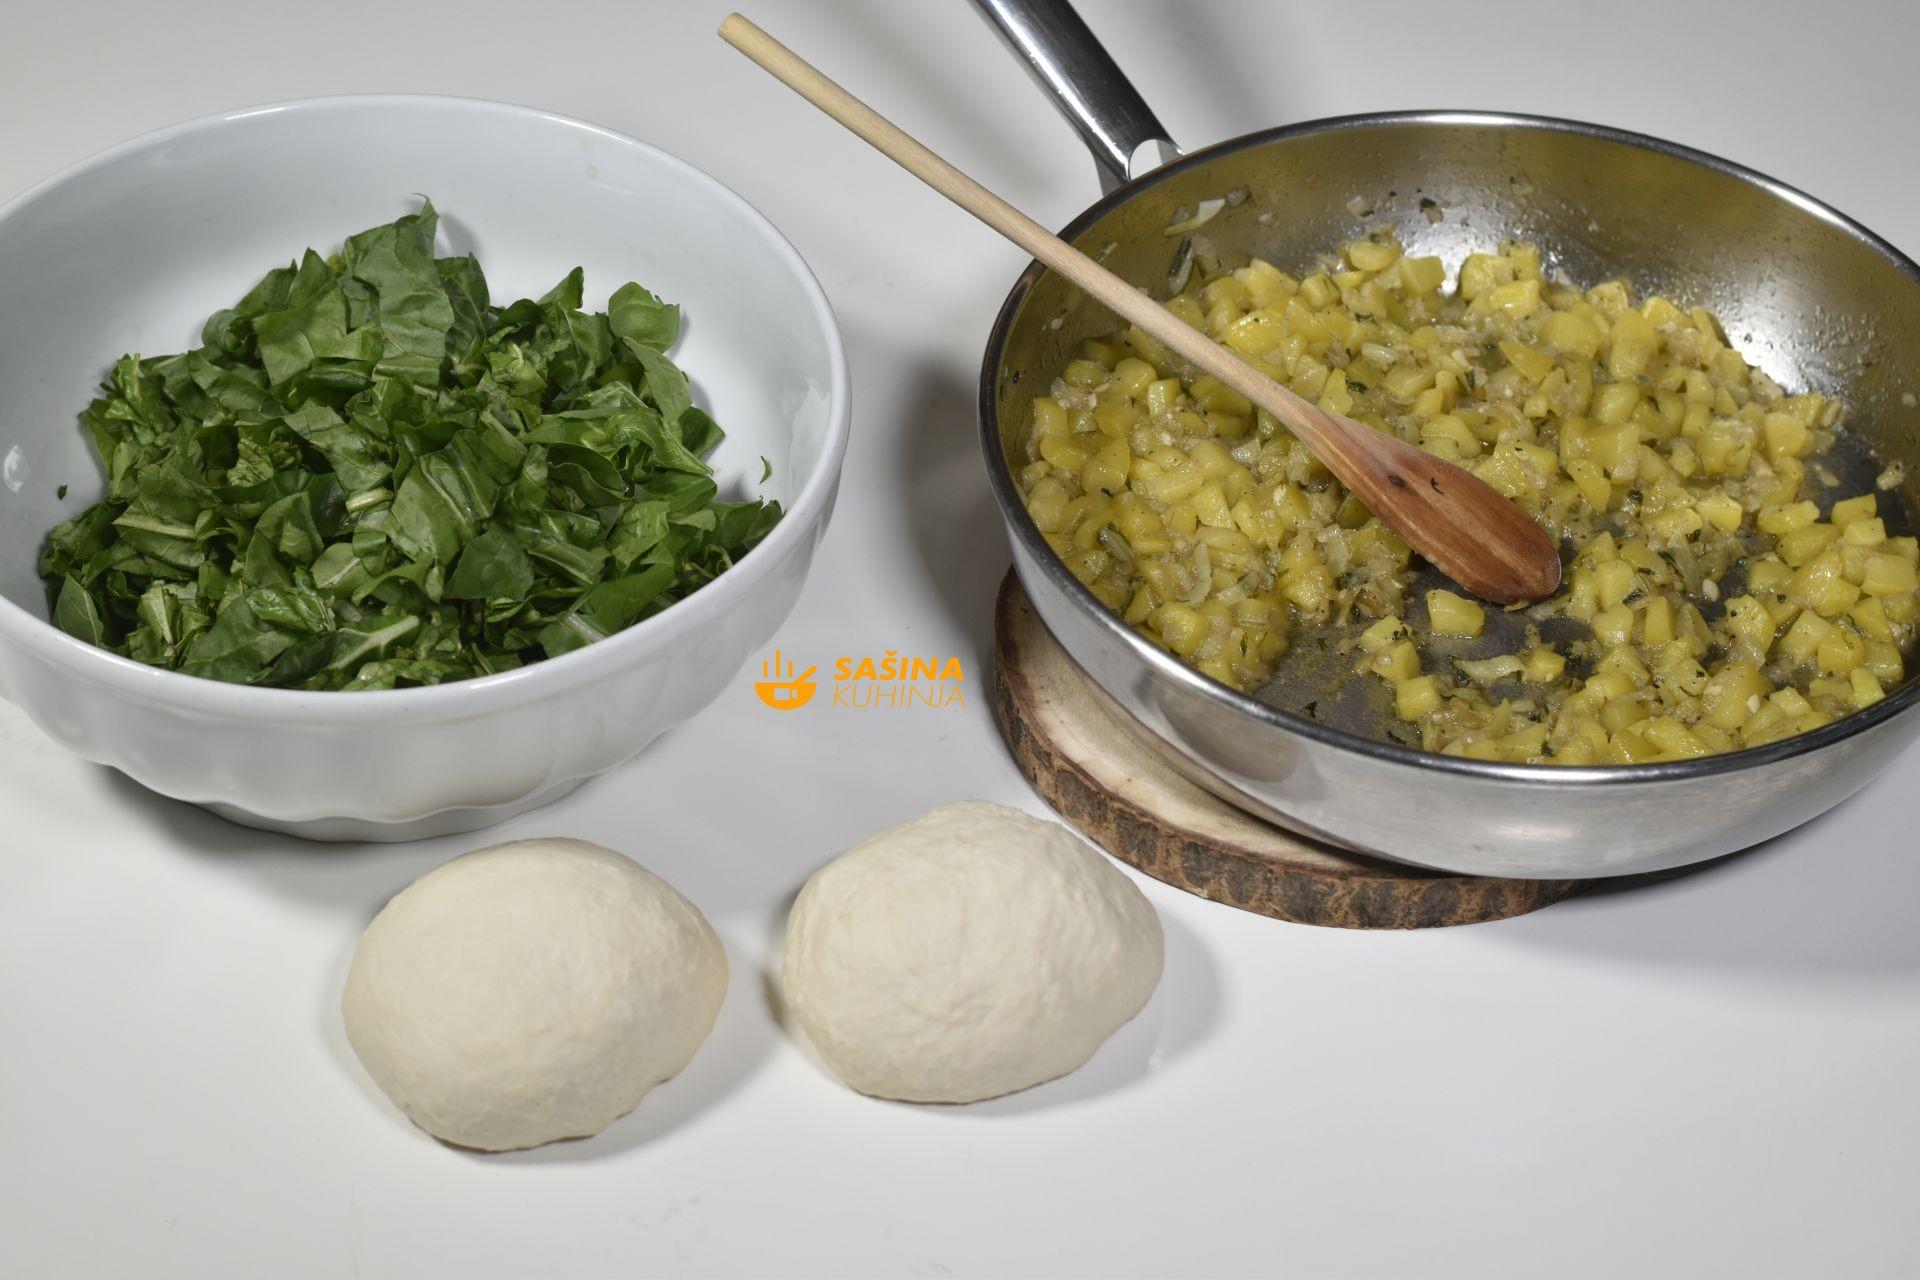 Šeširko vegetarijanski sendvić sa blitvom i krumpirom recept